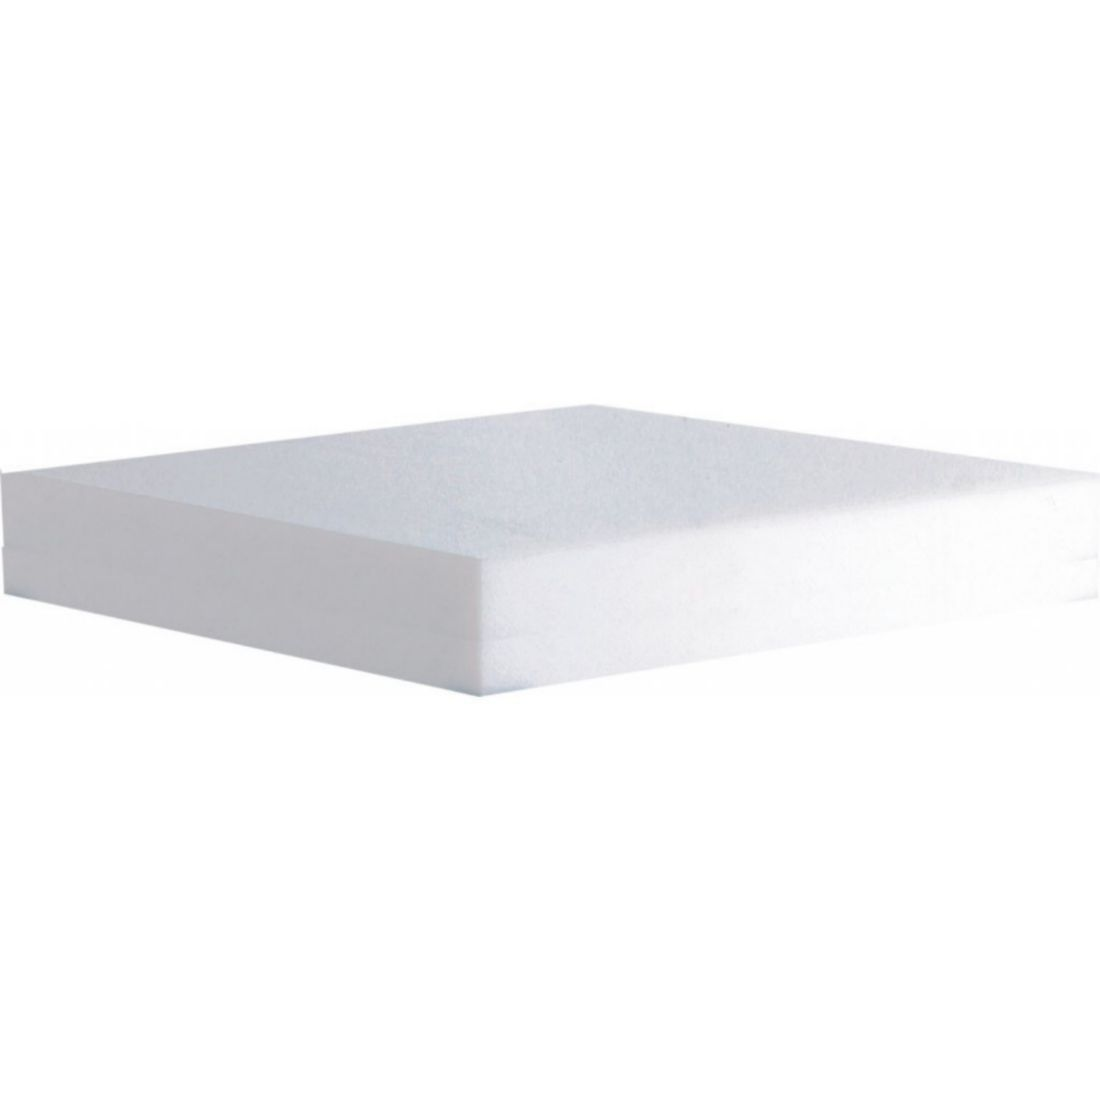 Blok porcovací polyetylen 60x60 cm, výška 8 cm